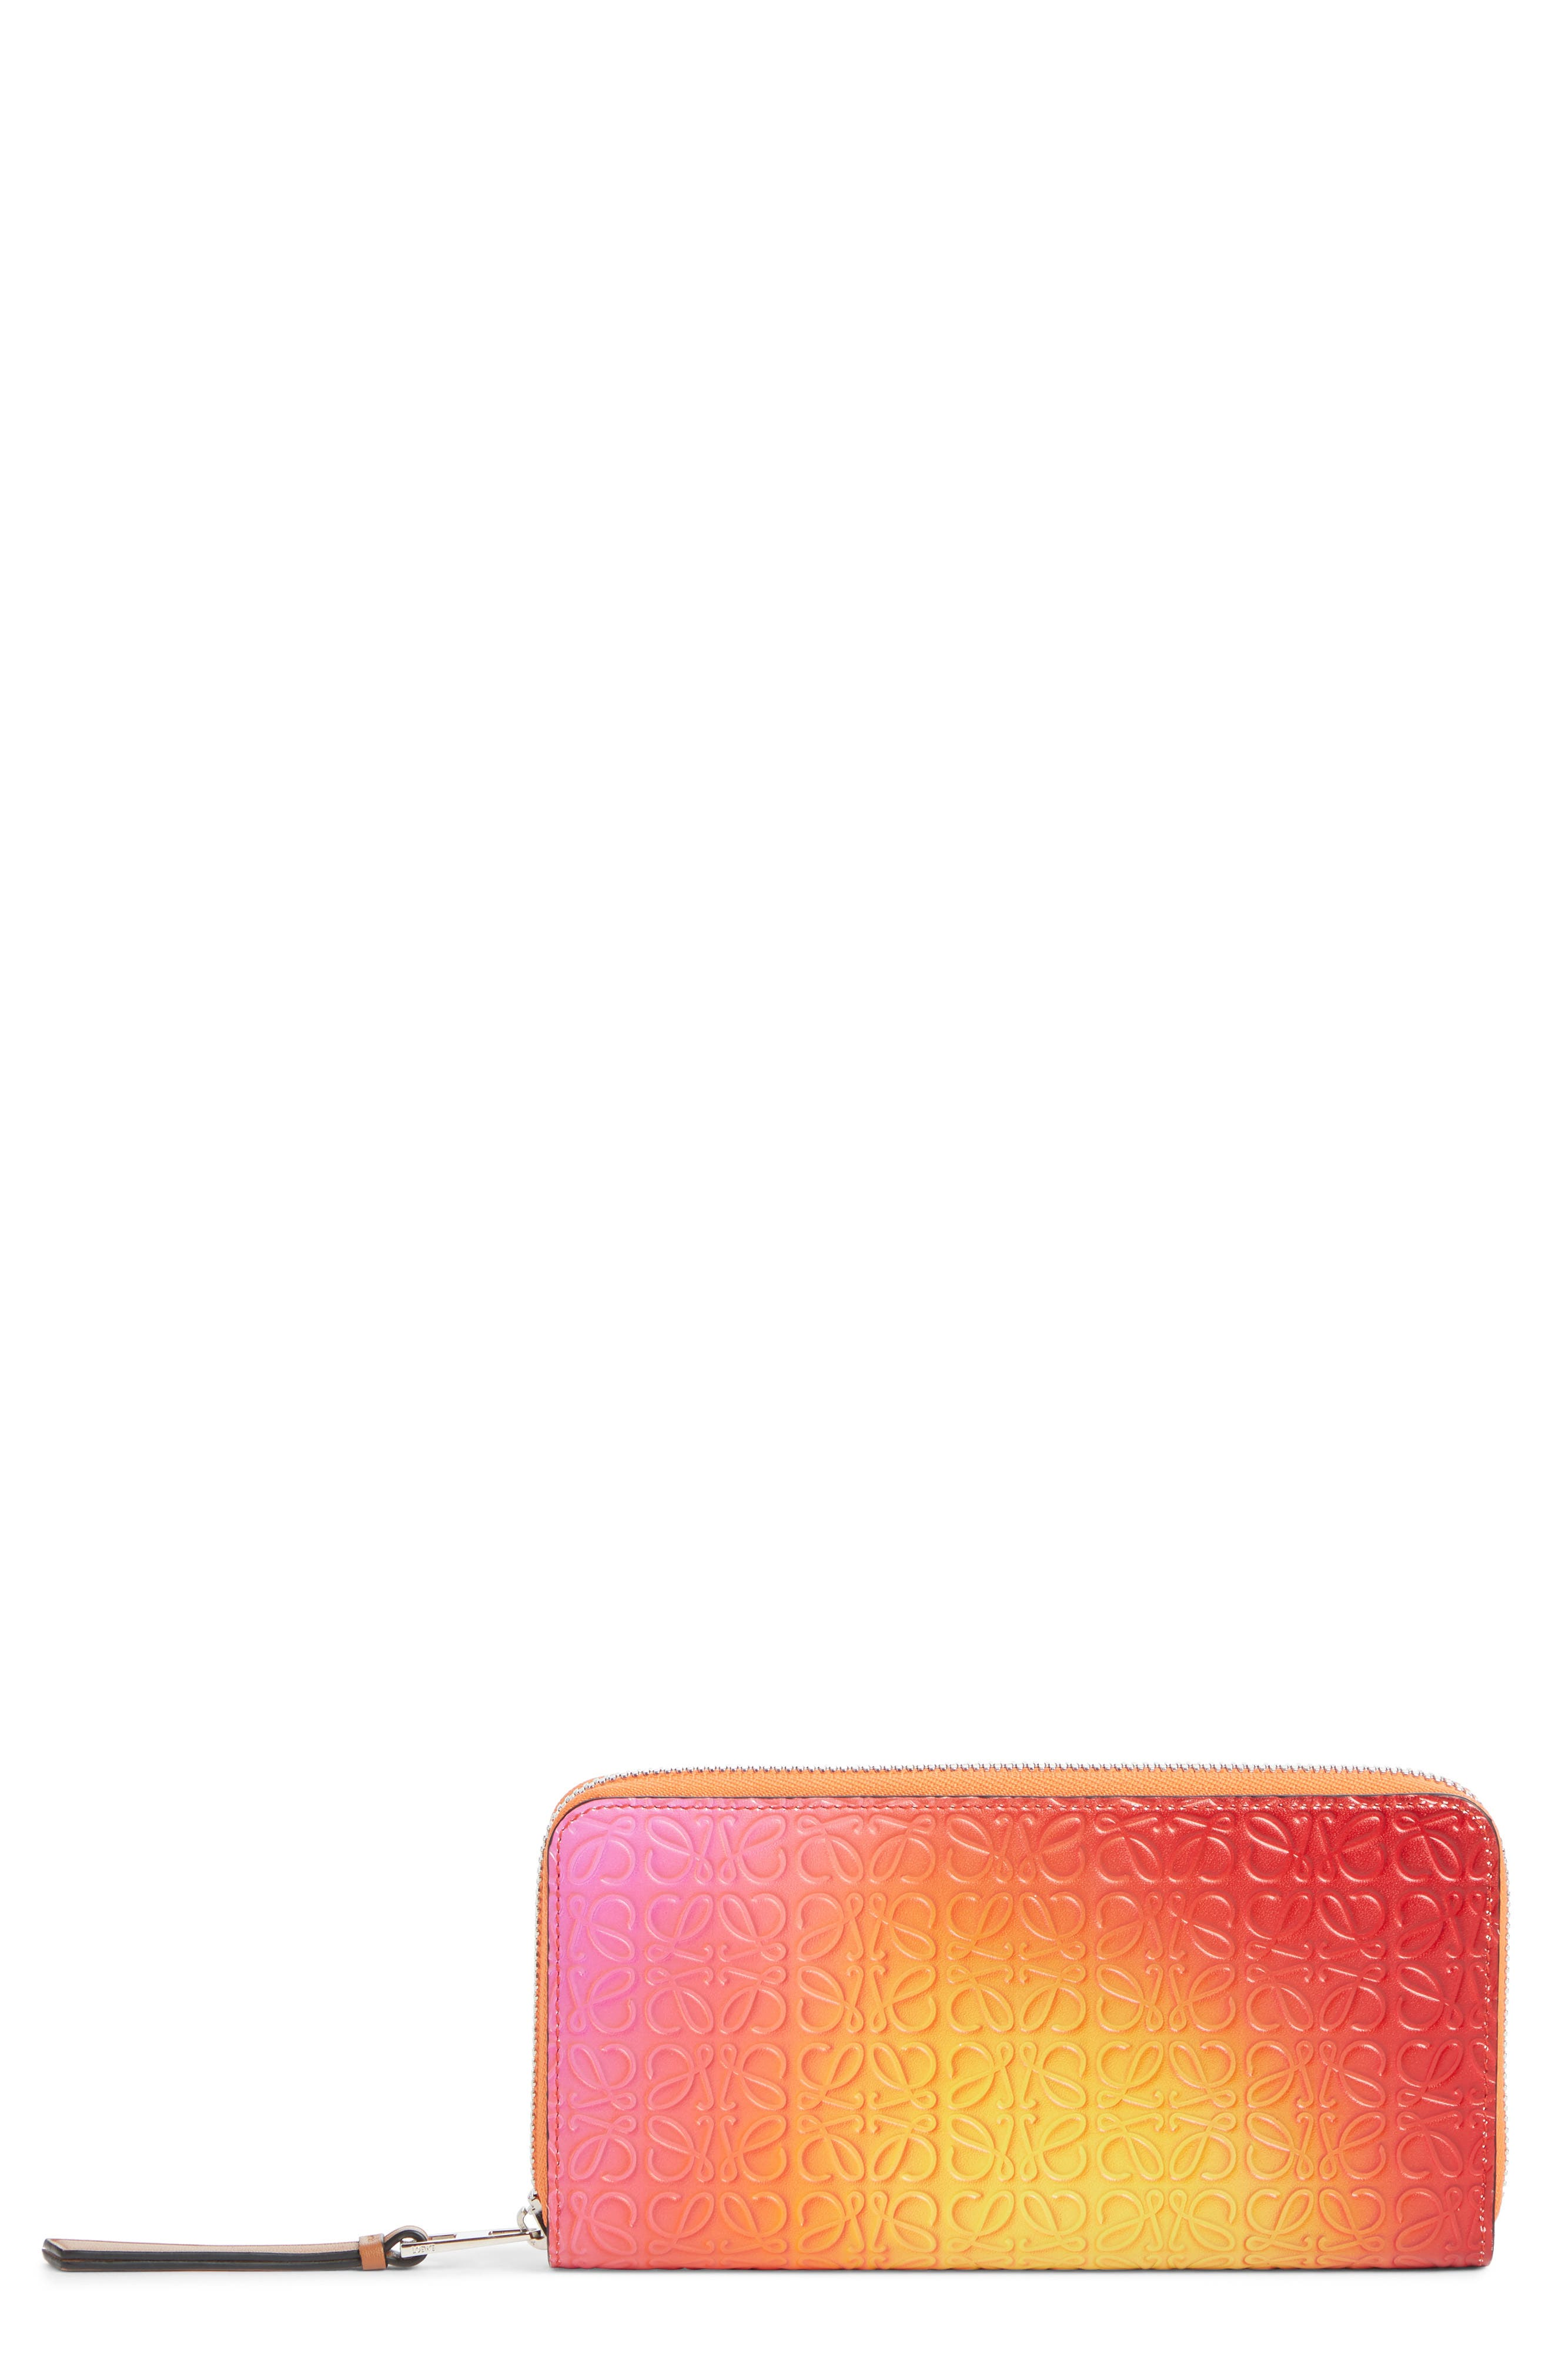 LOEWE,                             Embossed Ombré Leather Zip Around Wallet,                             Main thumbnail 1, color,                             ORANGE SUNSET